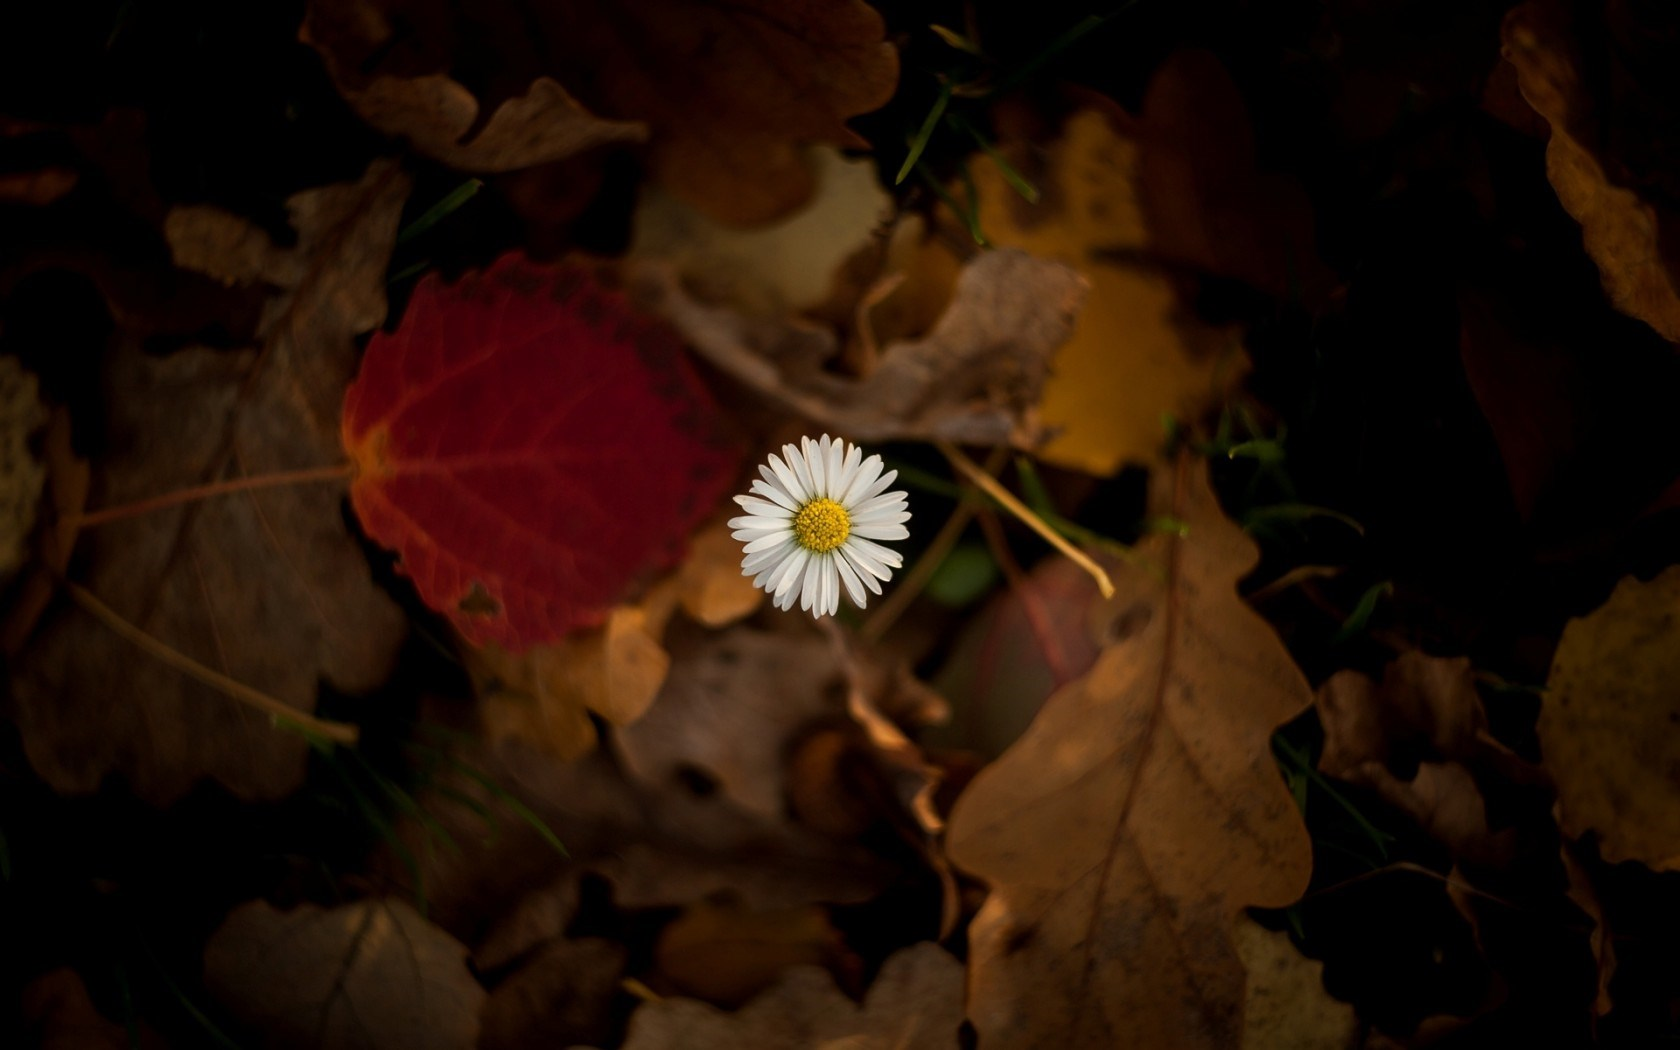 Flower Chamomile Leaves Autumn HD Wallpaper